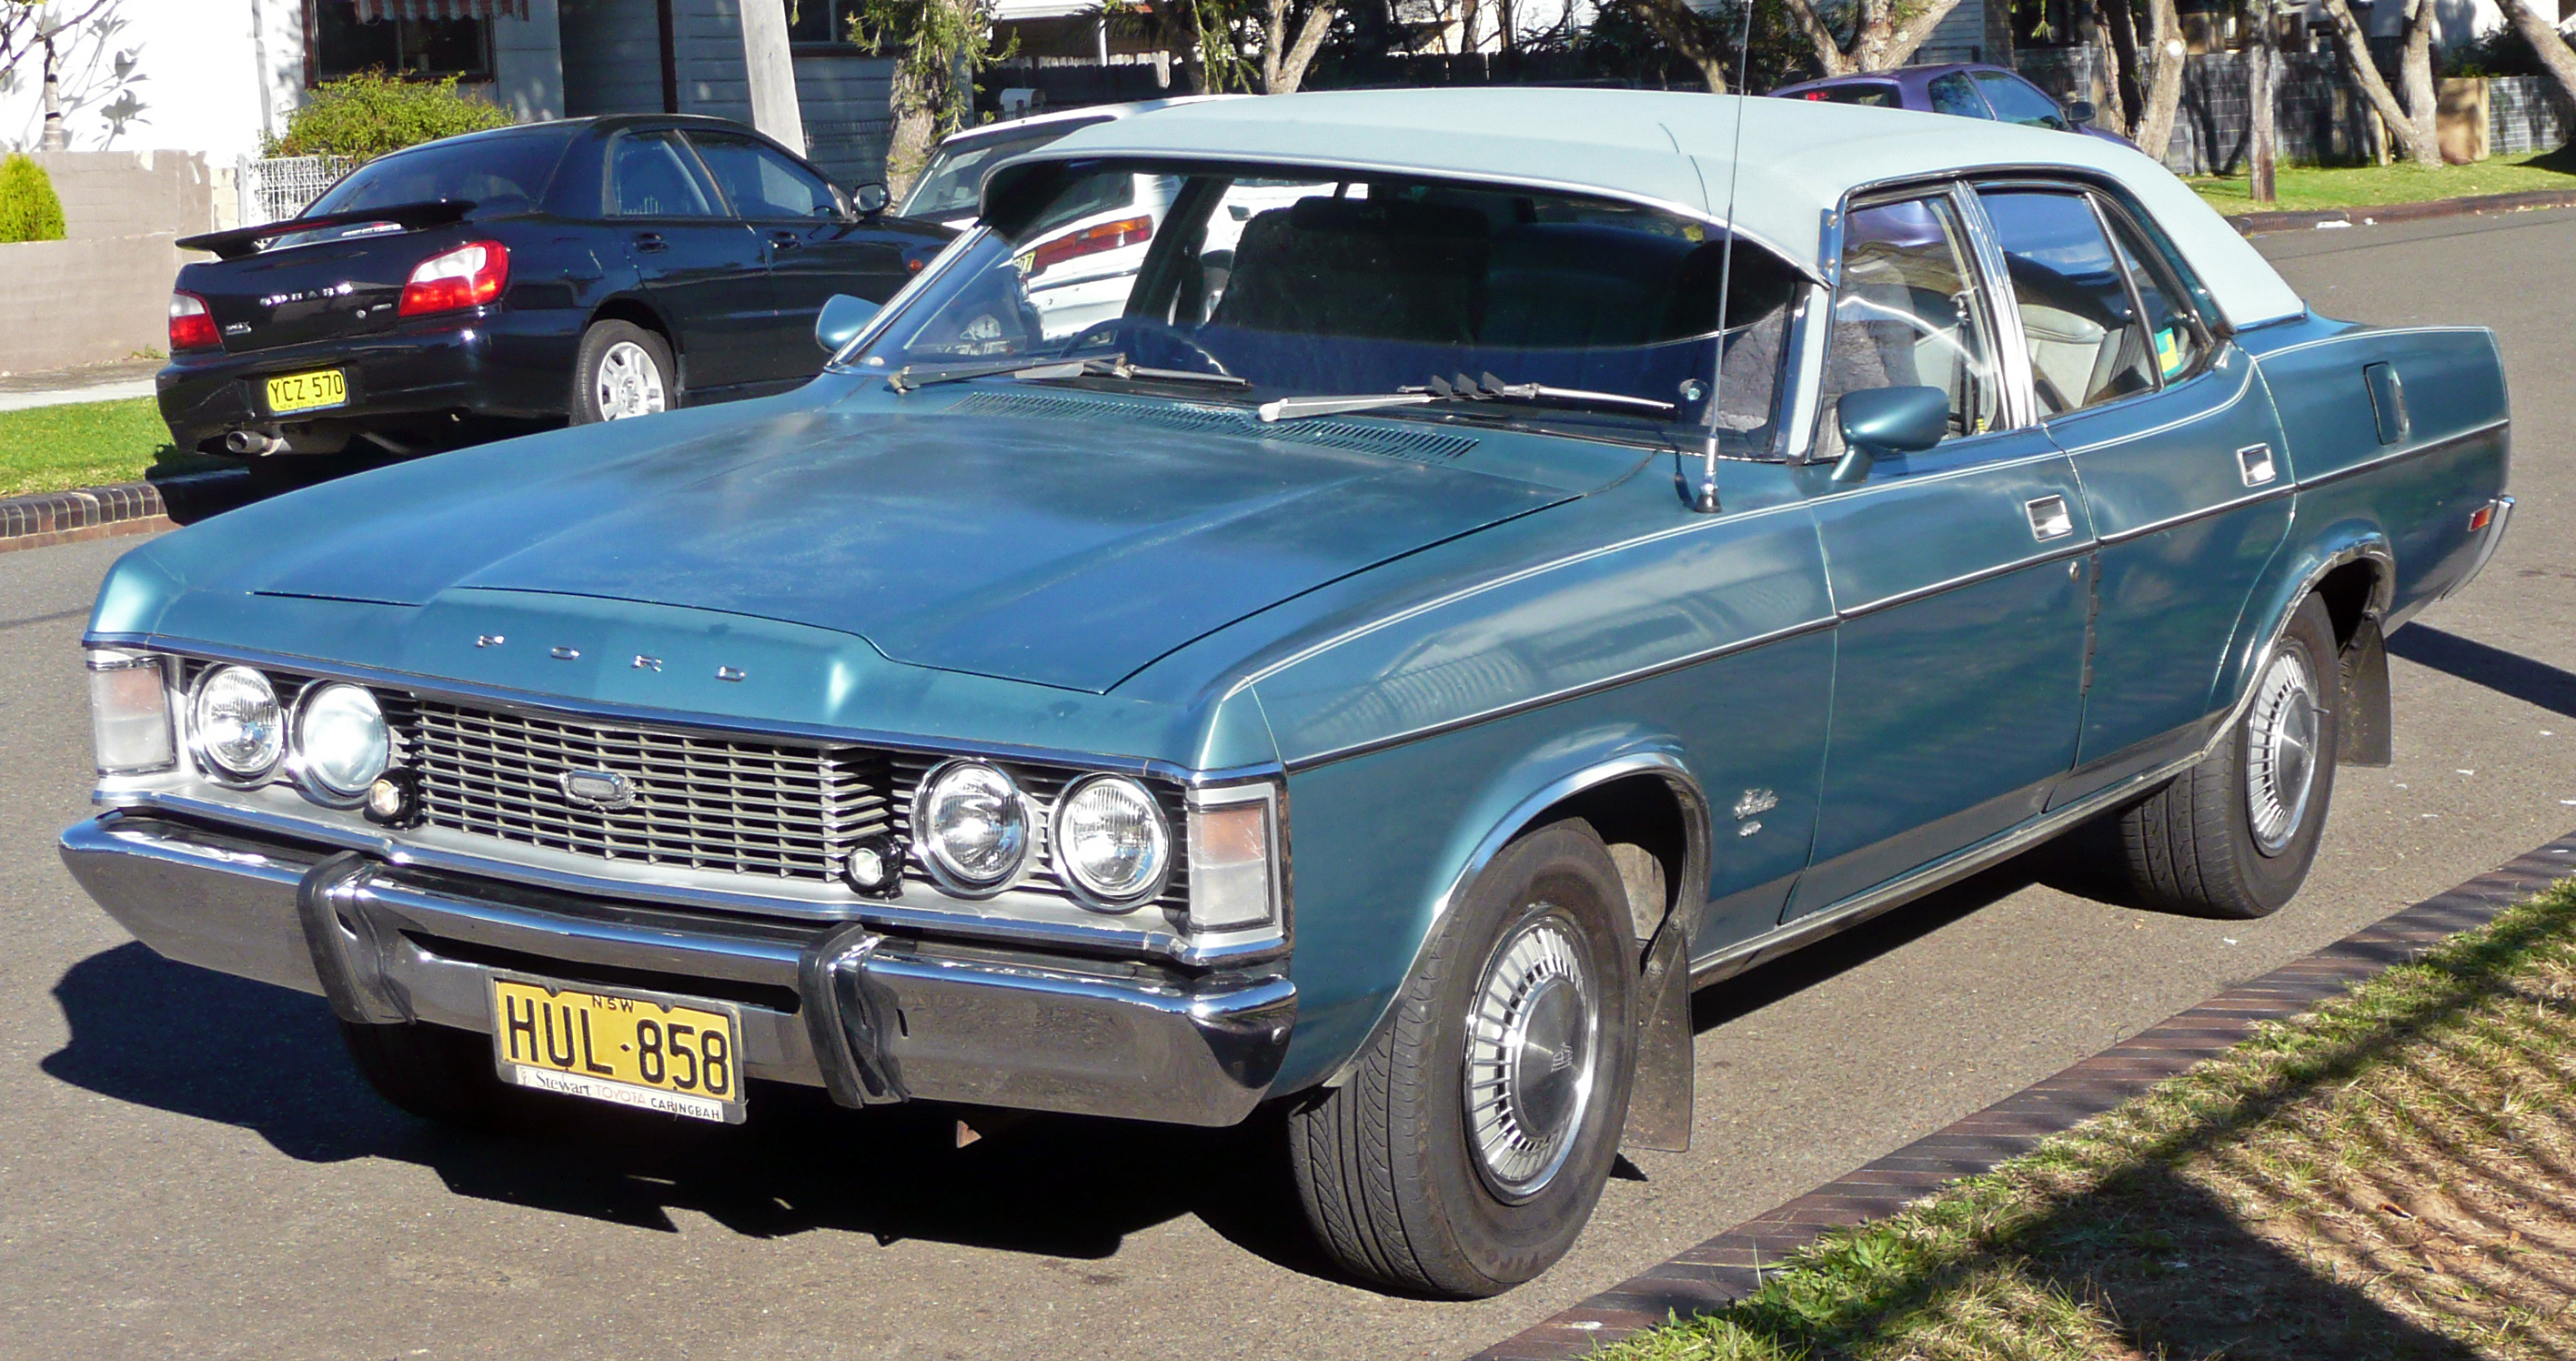 Image Result For Ford Torino In Australia